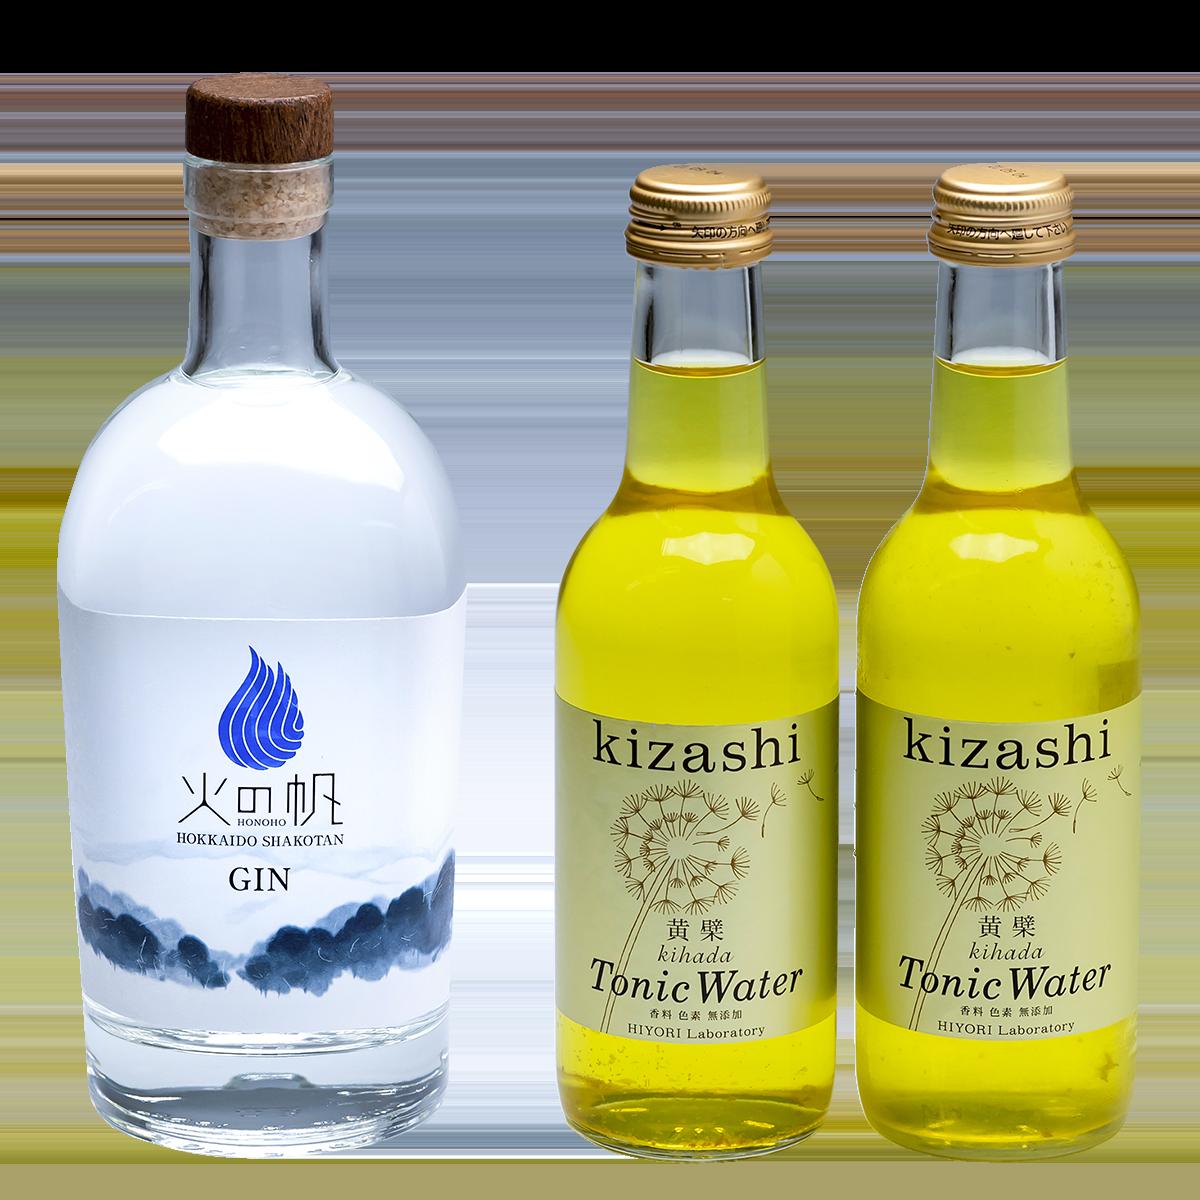 「KIBOU」(希望)&「kizashi」(兆し)のジントニックセット【限定70セット】